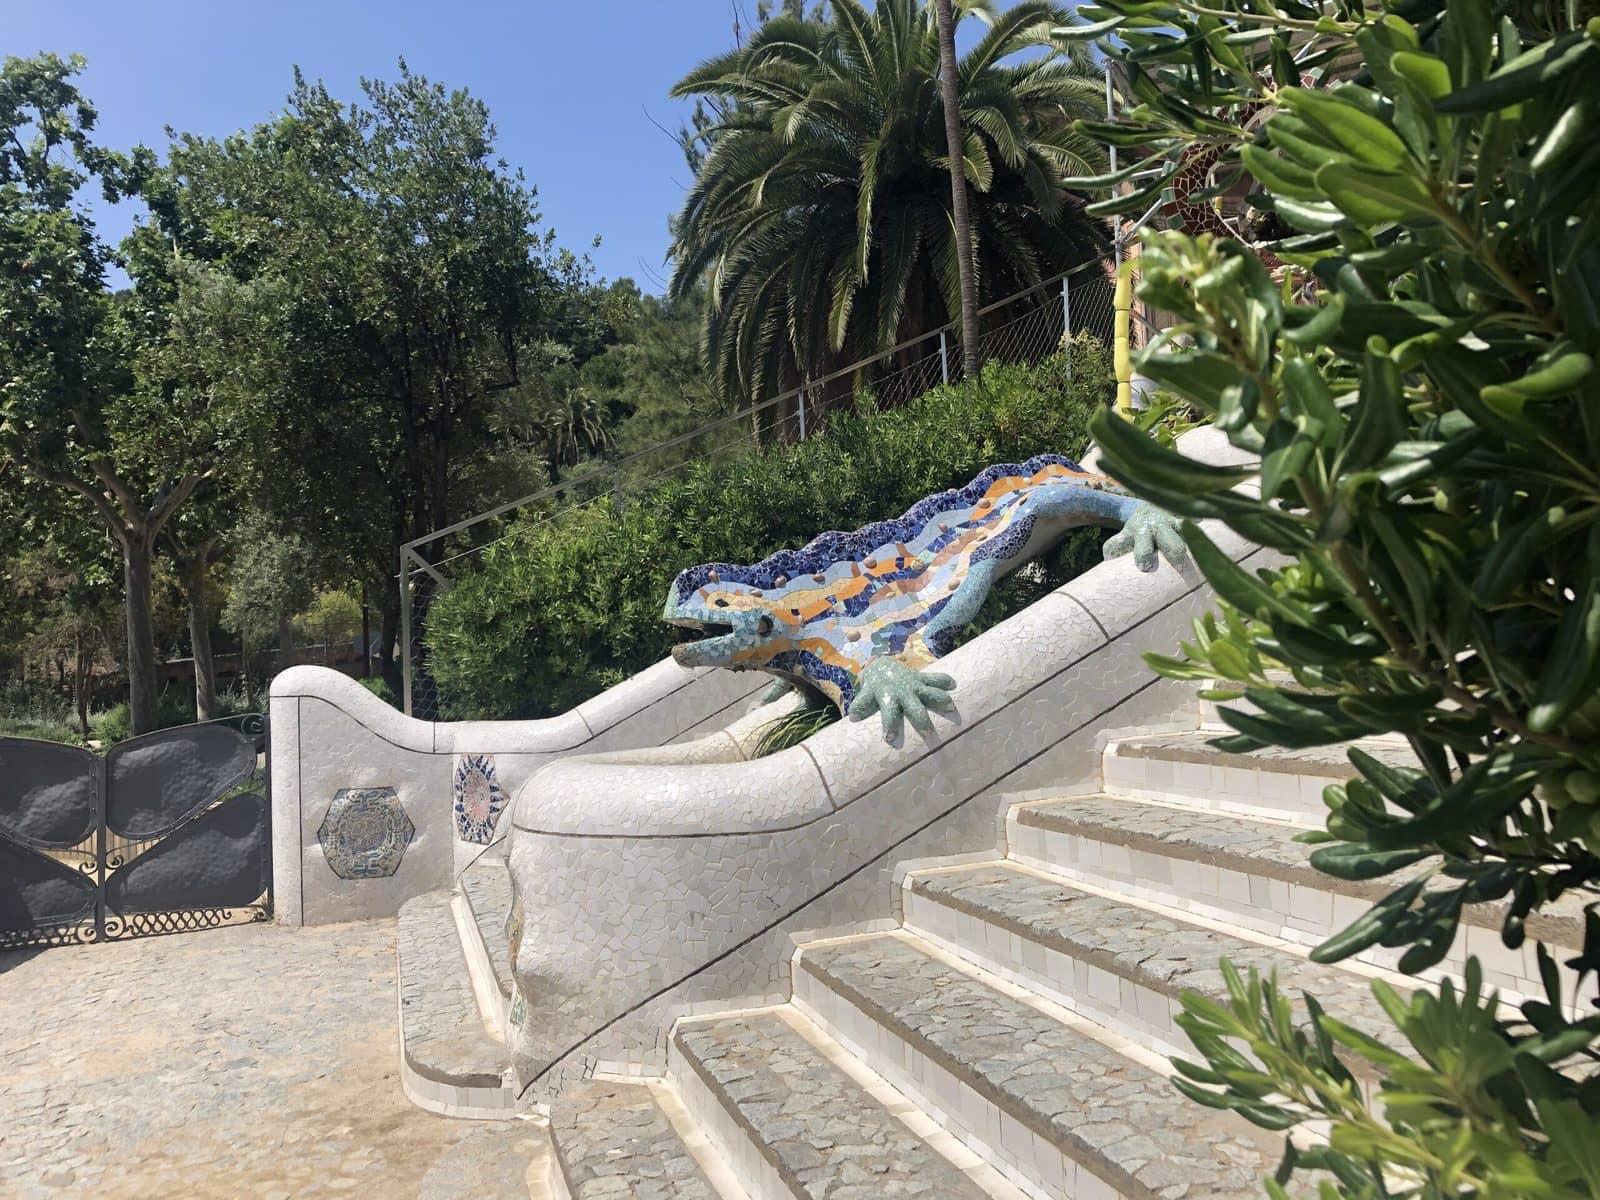 Der berühmte Drache im Park Güell, Barcelona